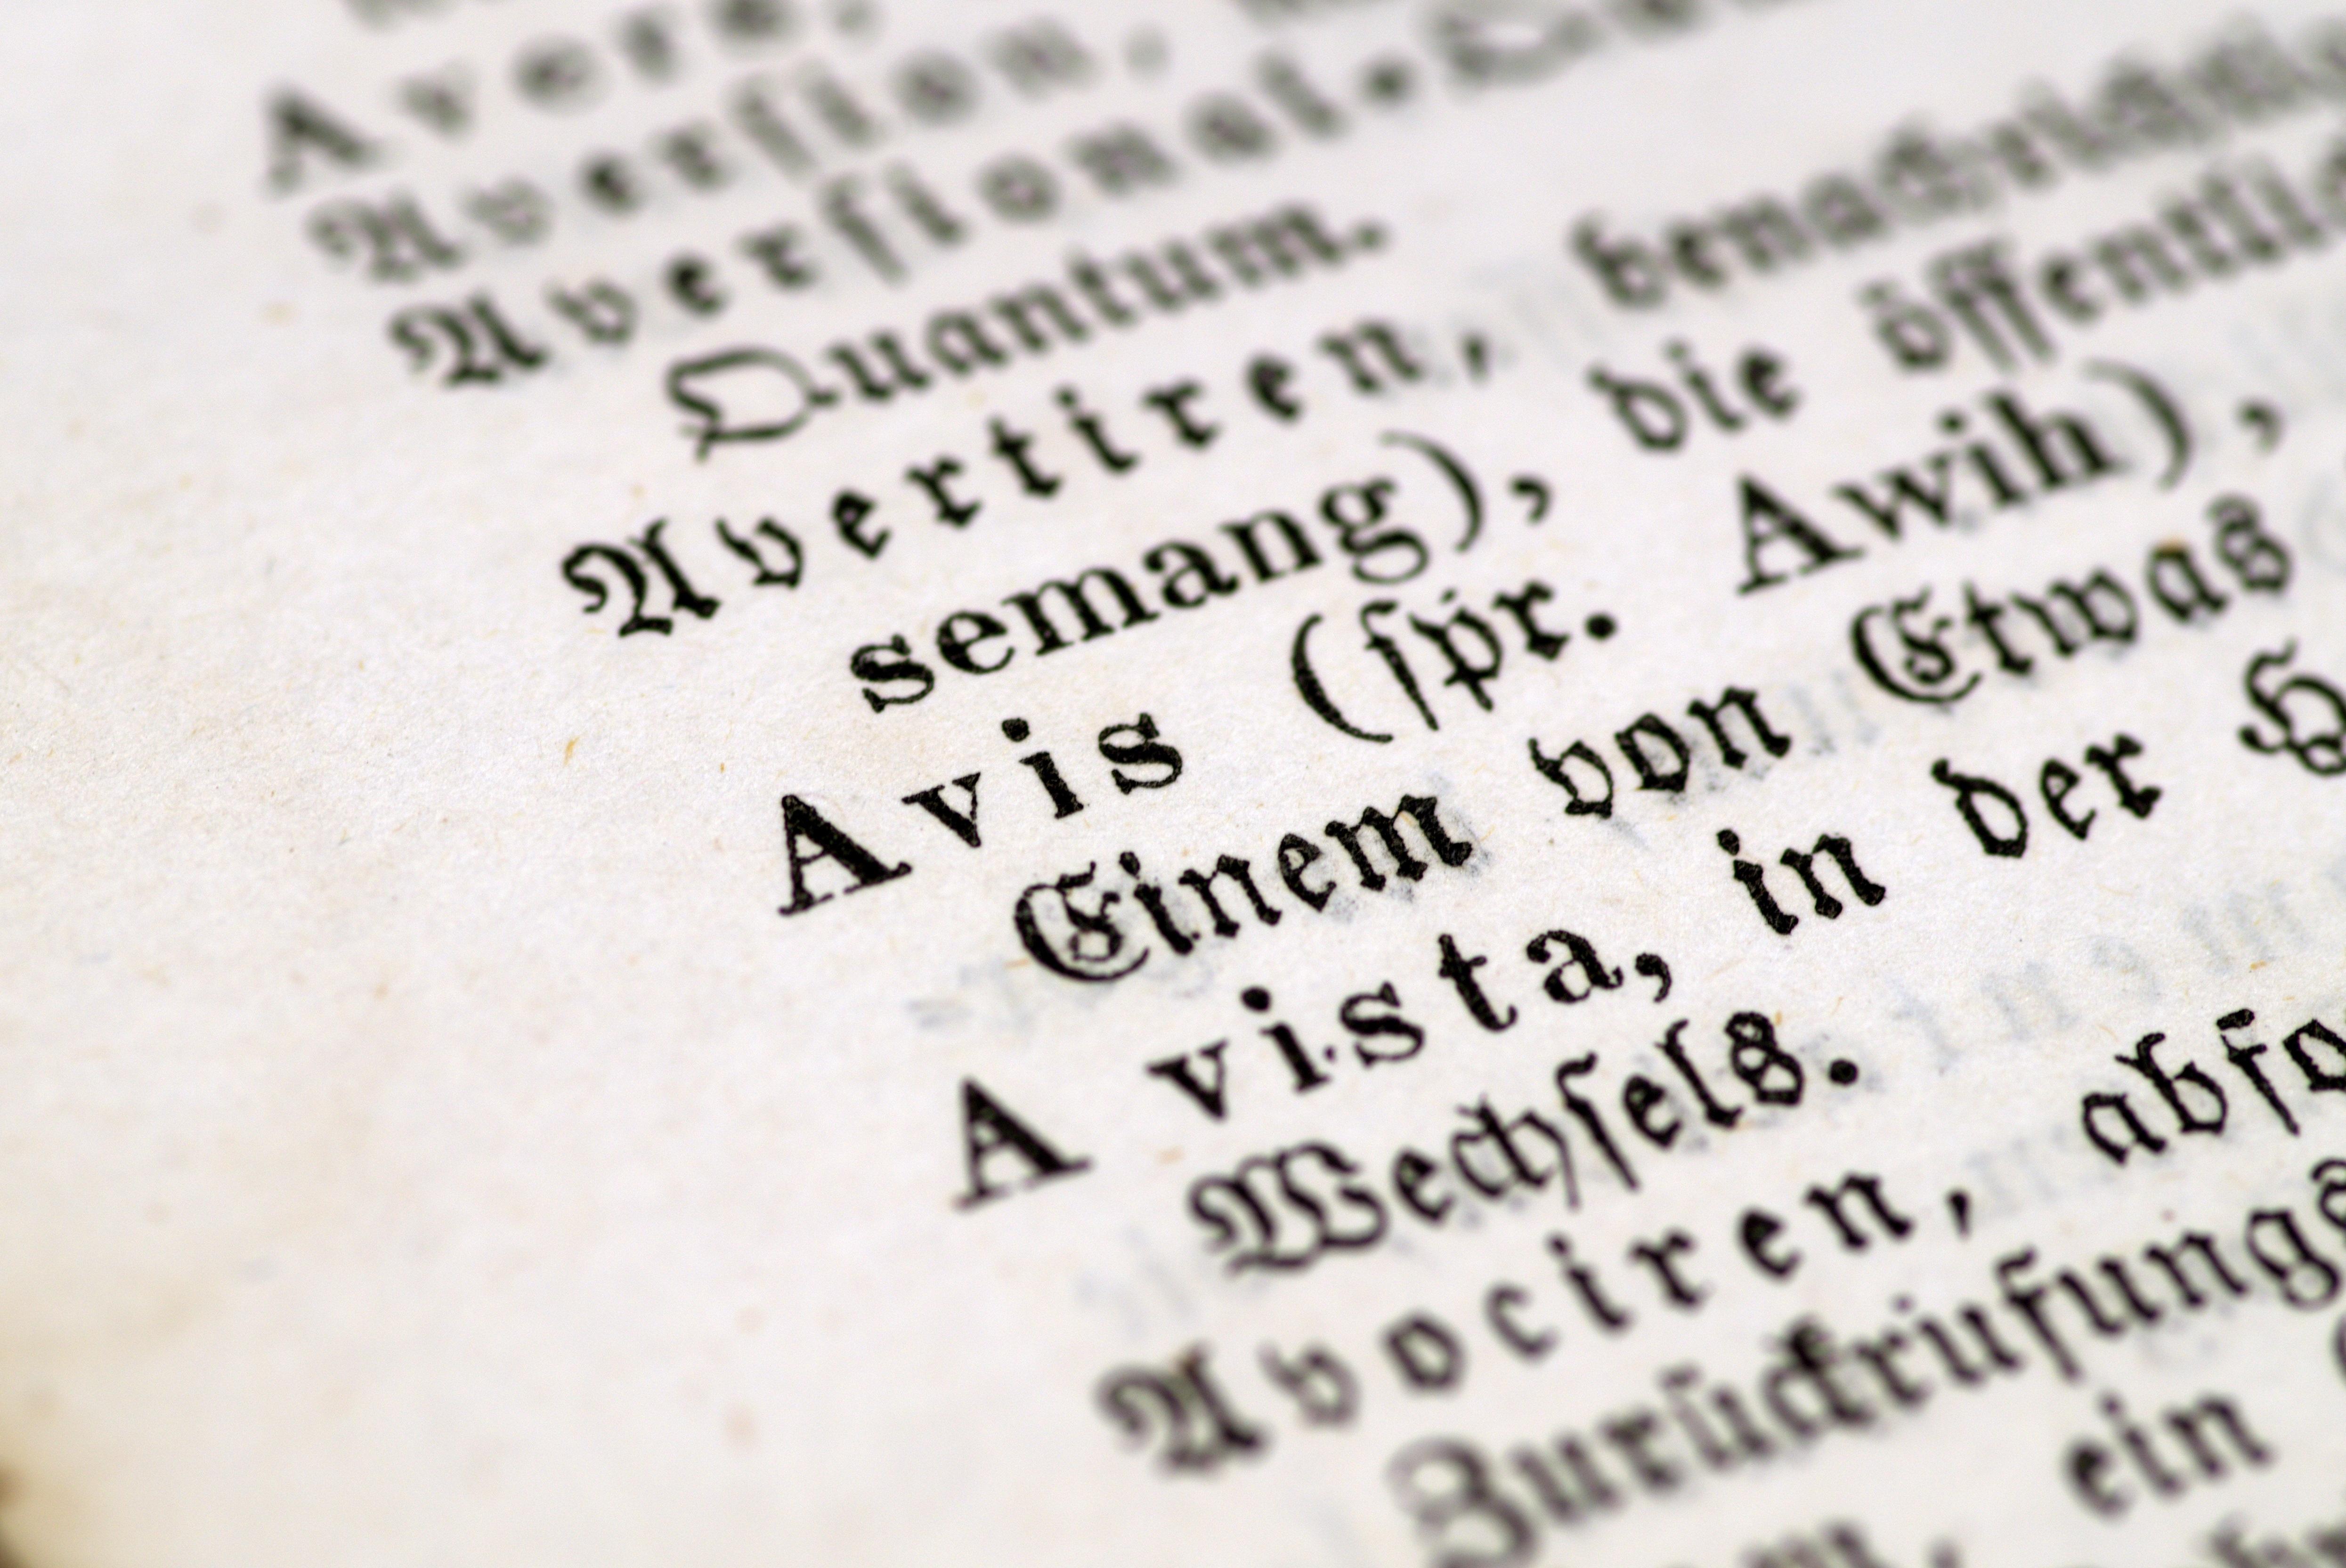 Gambar Penulisan Book Garis Gotik Buku Lama Merek Fon